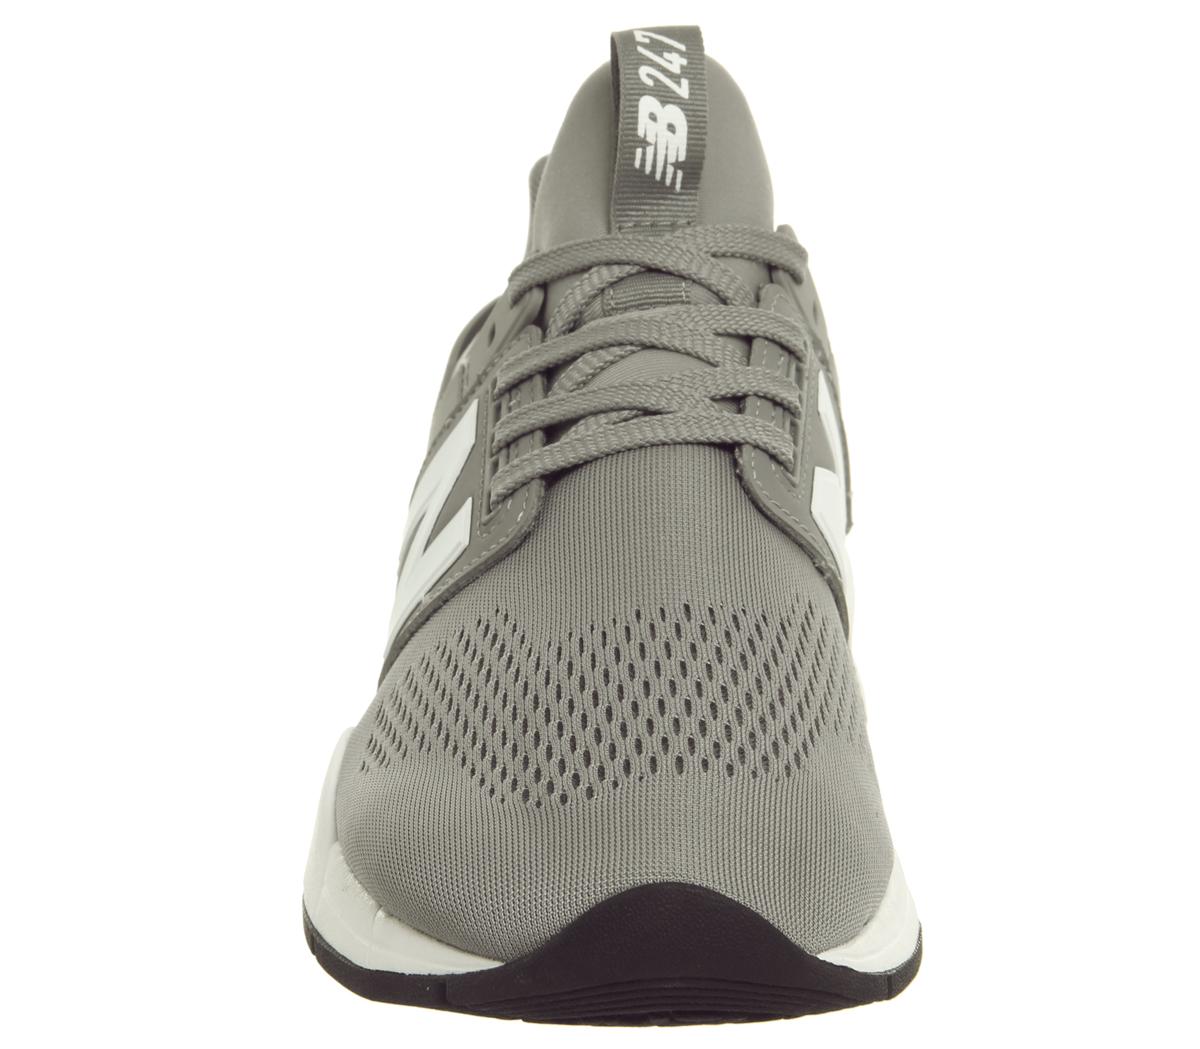 New-Balance-247V2-Baskets-Marblehead-Baskets-Chaussures miniature 5